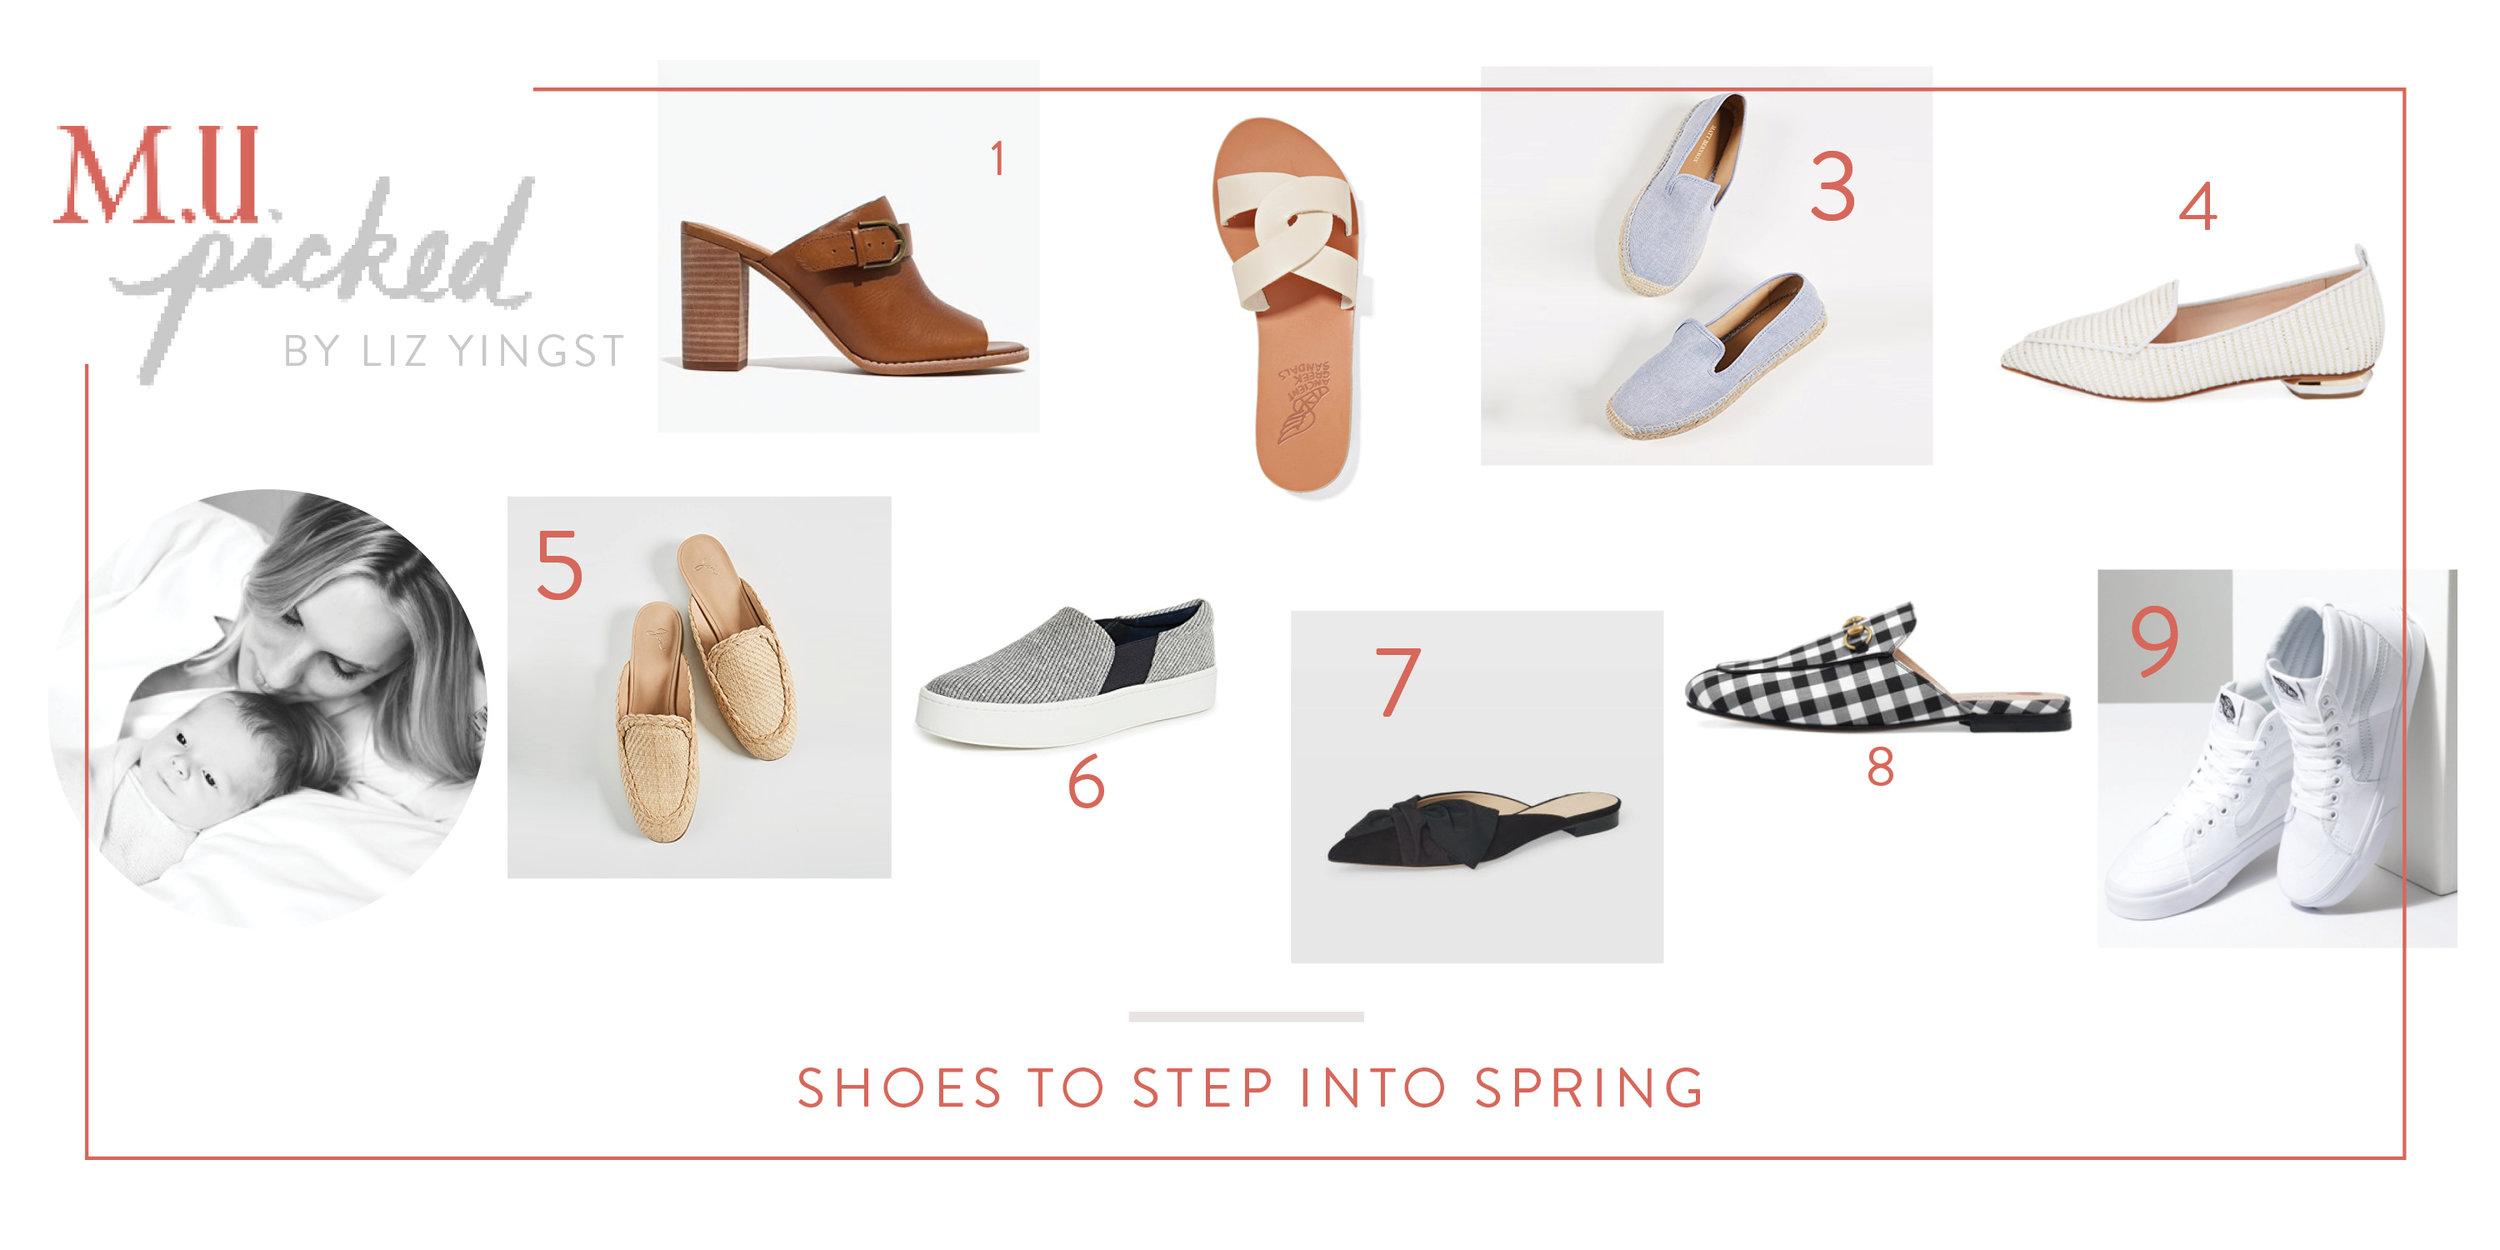 MUPICKED_SpringShoes.jpg